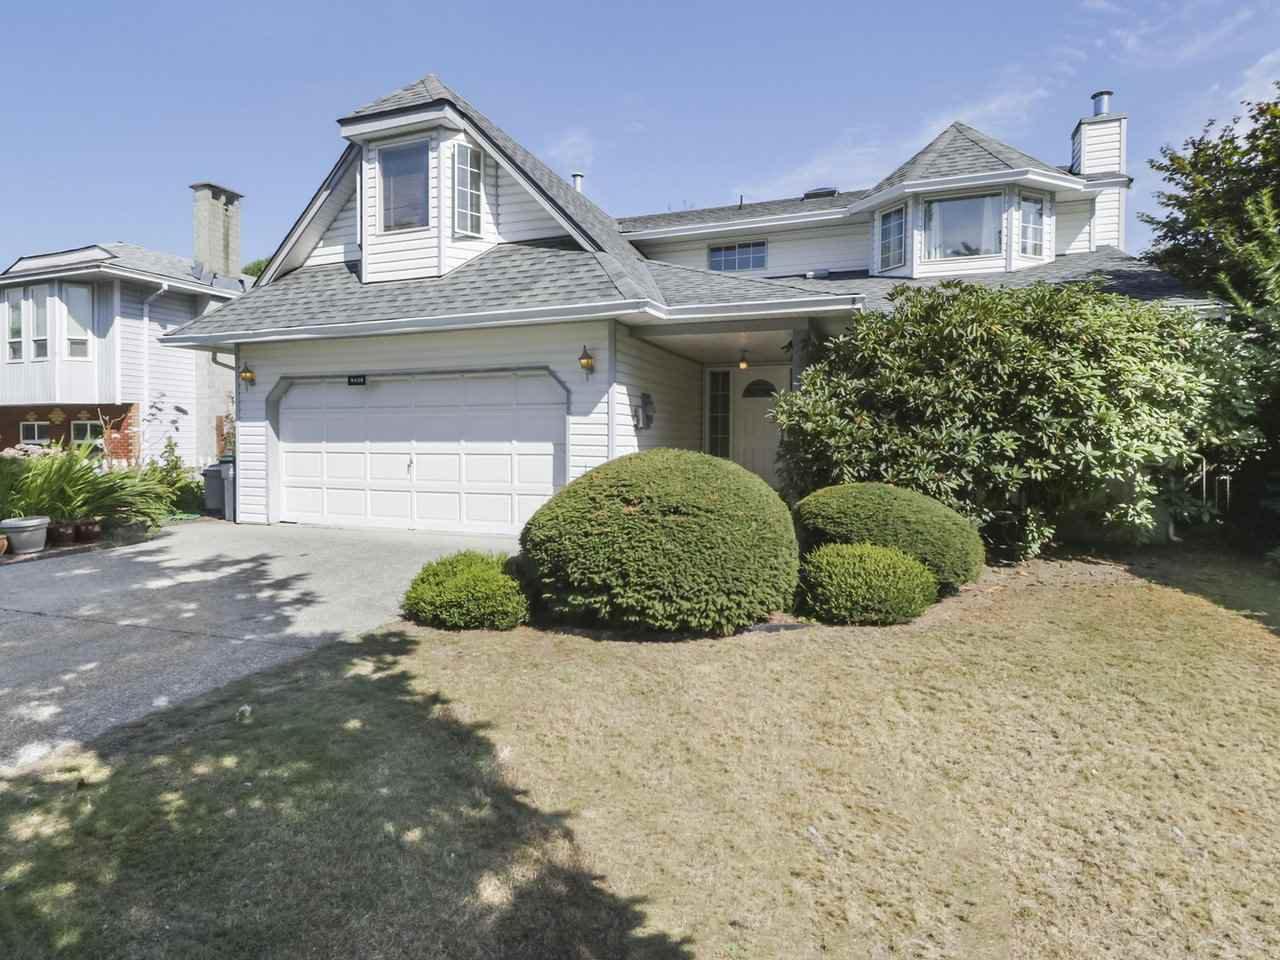 Main Photo: 9438 152A Street in Surrey: Fleetwood Tynehead House for sale : MLS®# R2403711